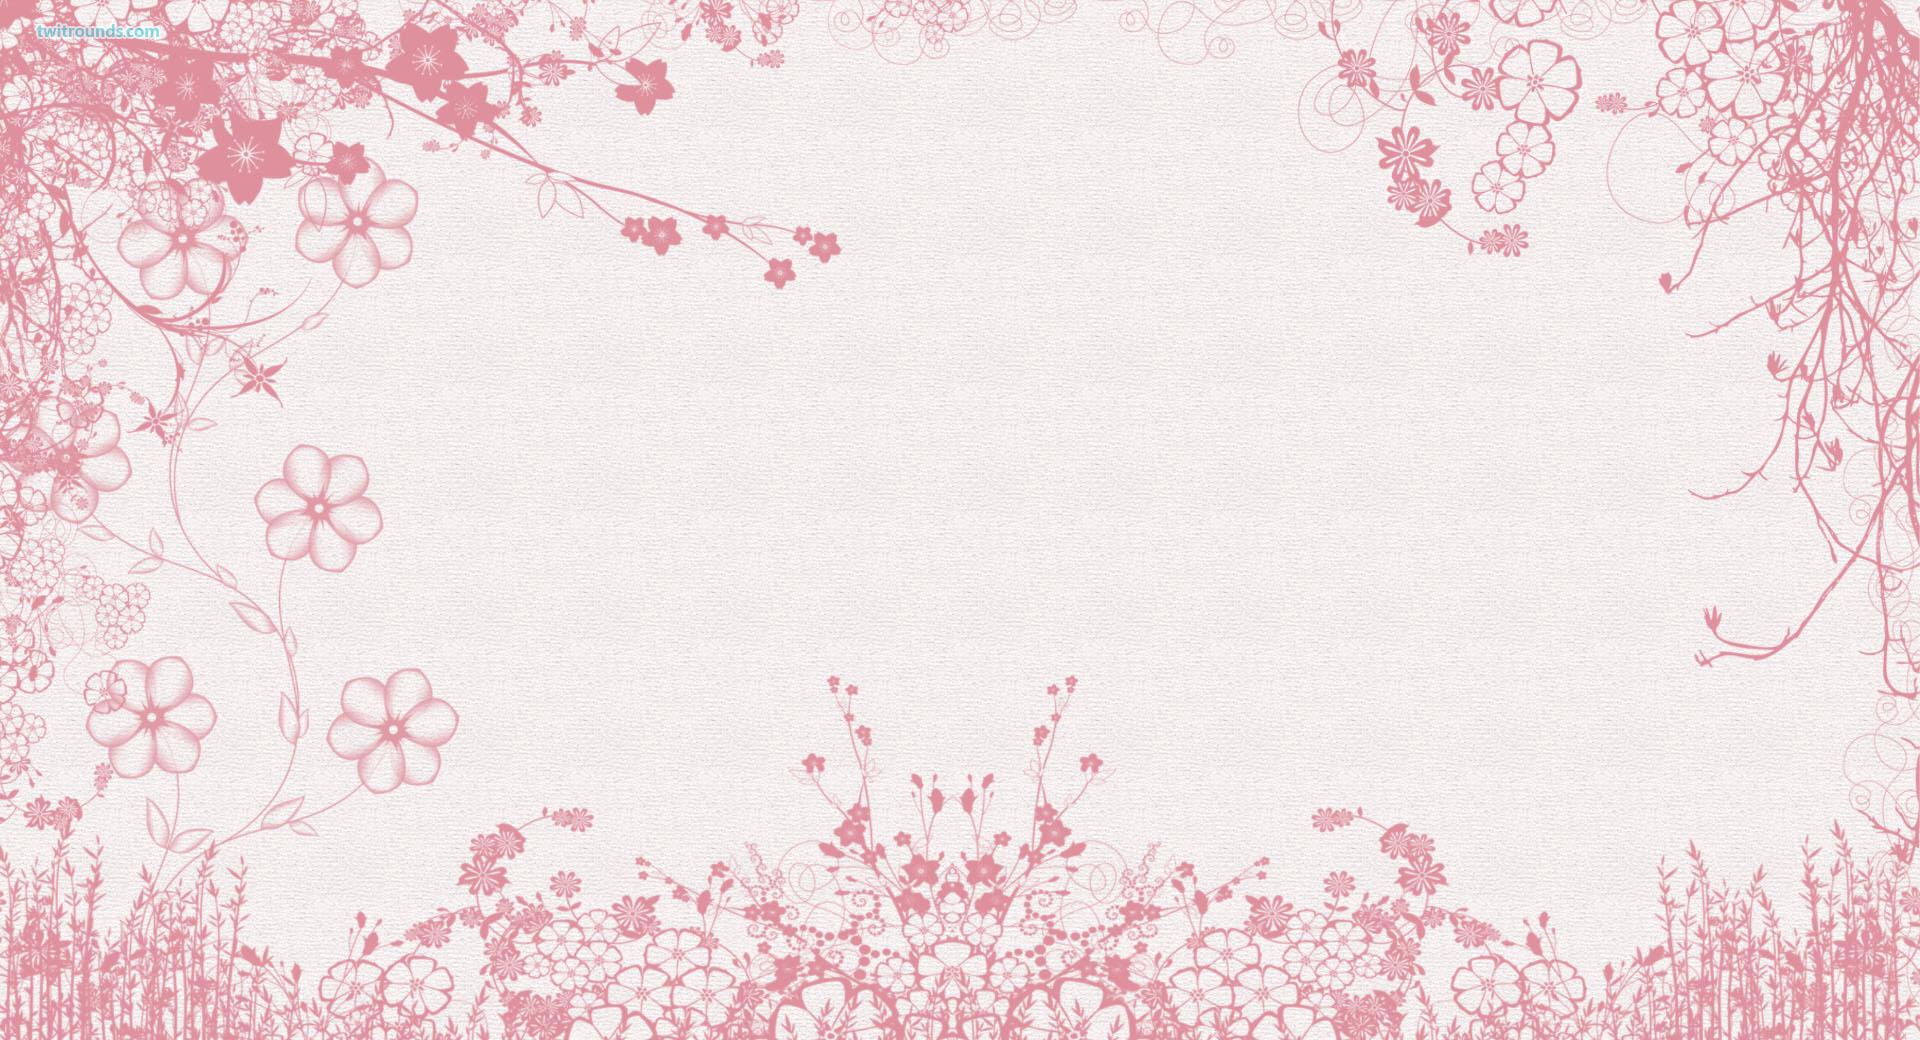 White Pink Flowers Wallpaper 6741 Wallpaper Cool Walldiskpapercom 1920x1040